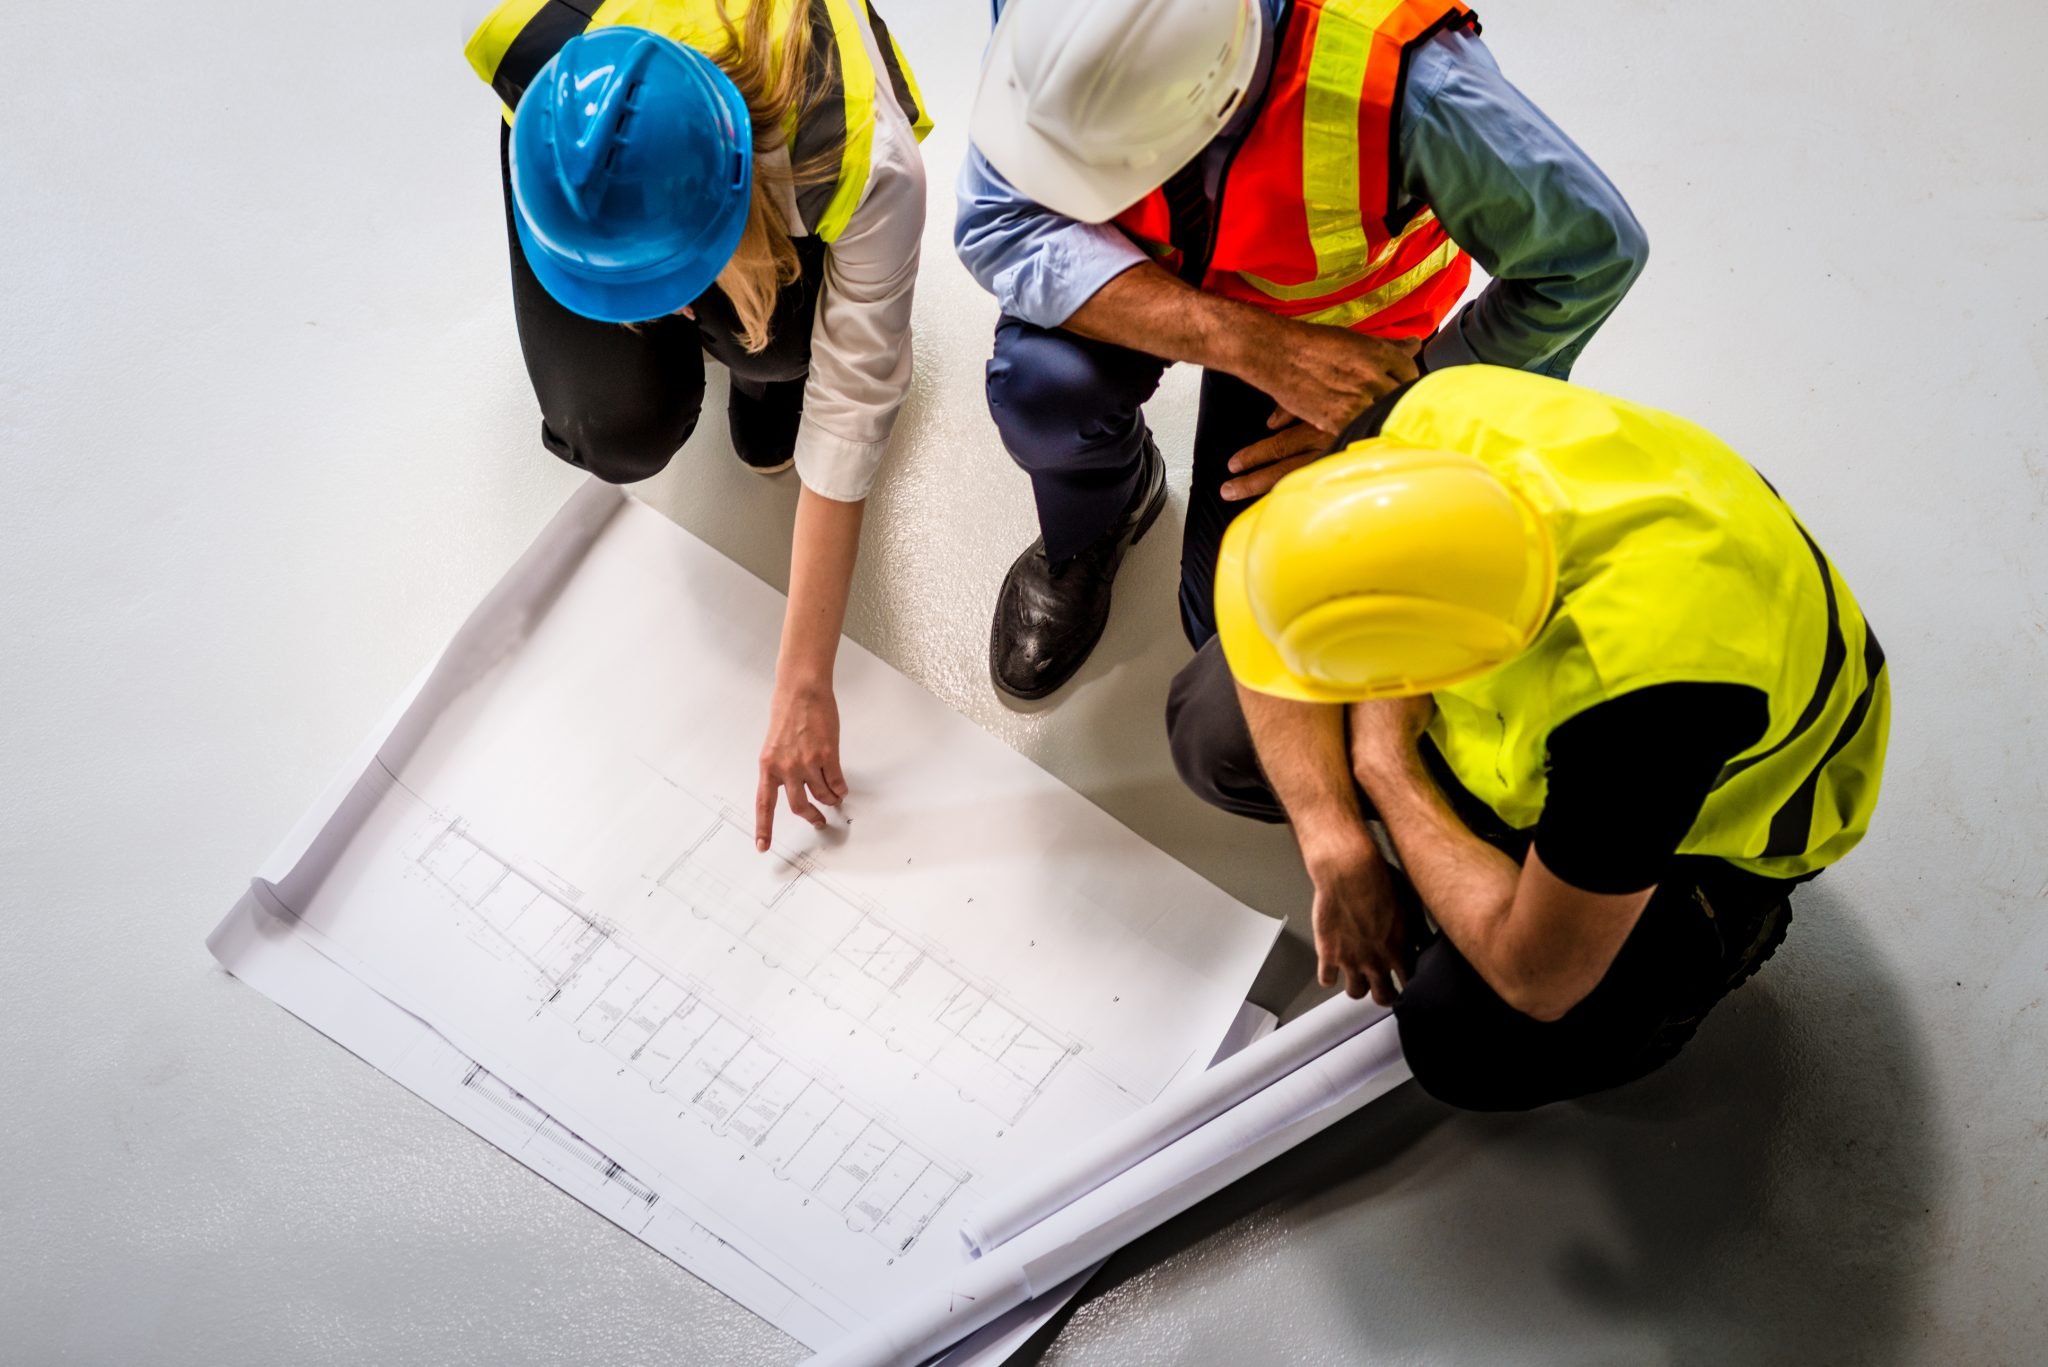 Image: Engineering & Trade Coordination